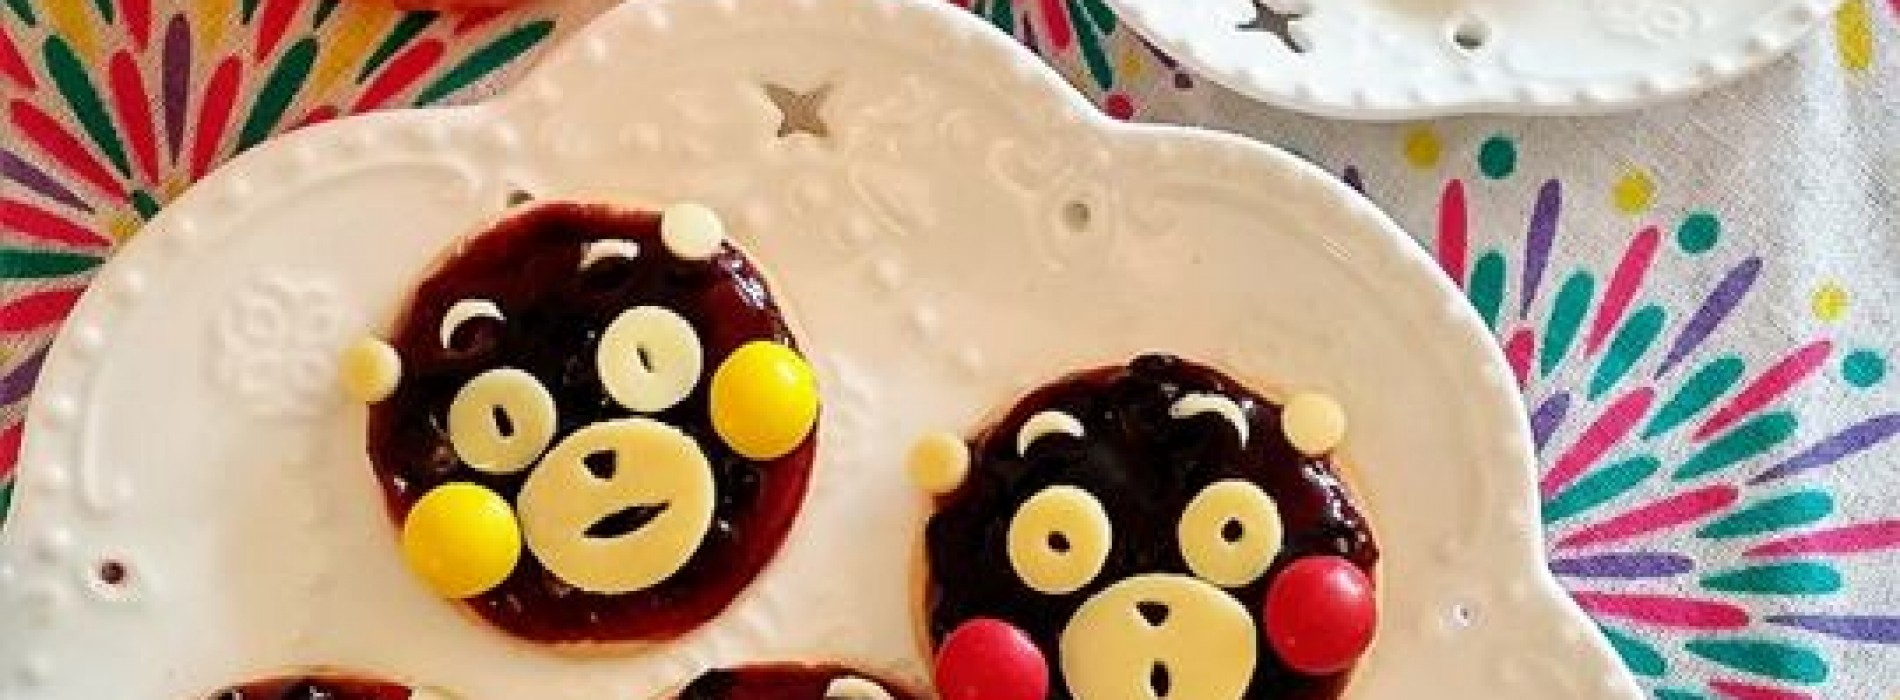 happy cook:diy熊本熊蓝莓饼 | peegaboo 百家宝亲子网